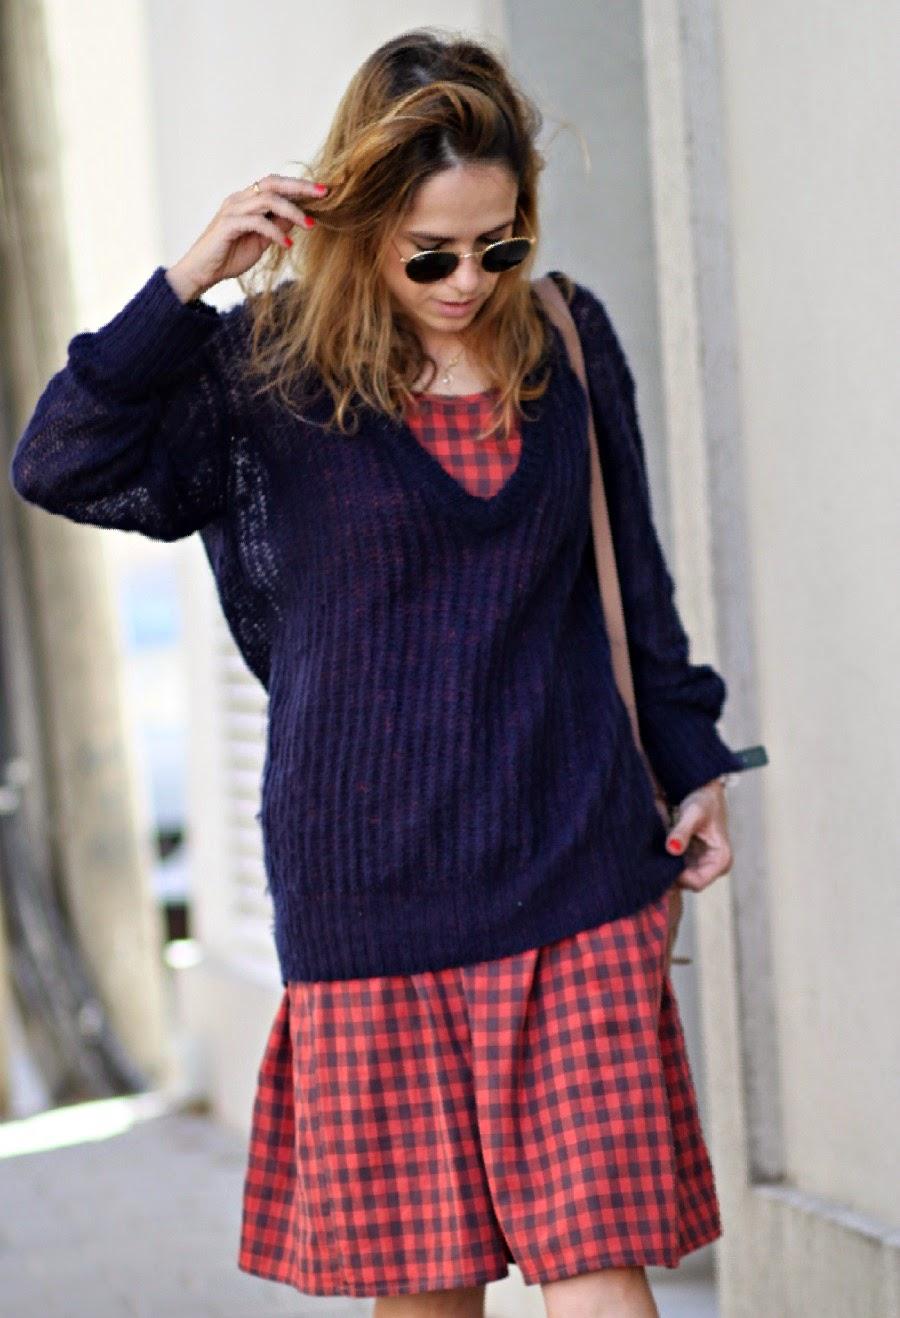 Gingham, dress, paris, pfw, coffee, style, lookoftheday, ss15, blog, fashionblog, בלוגאופנה, אופנה